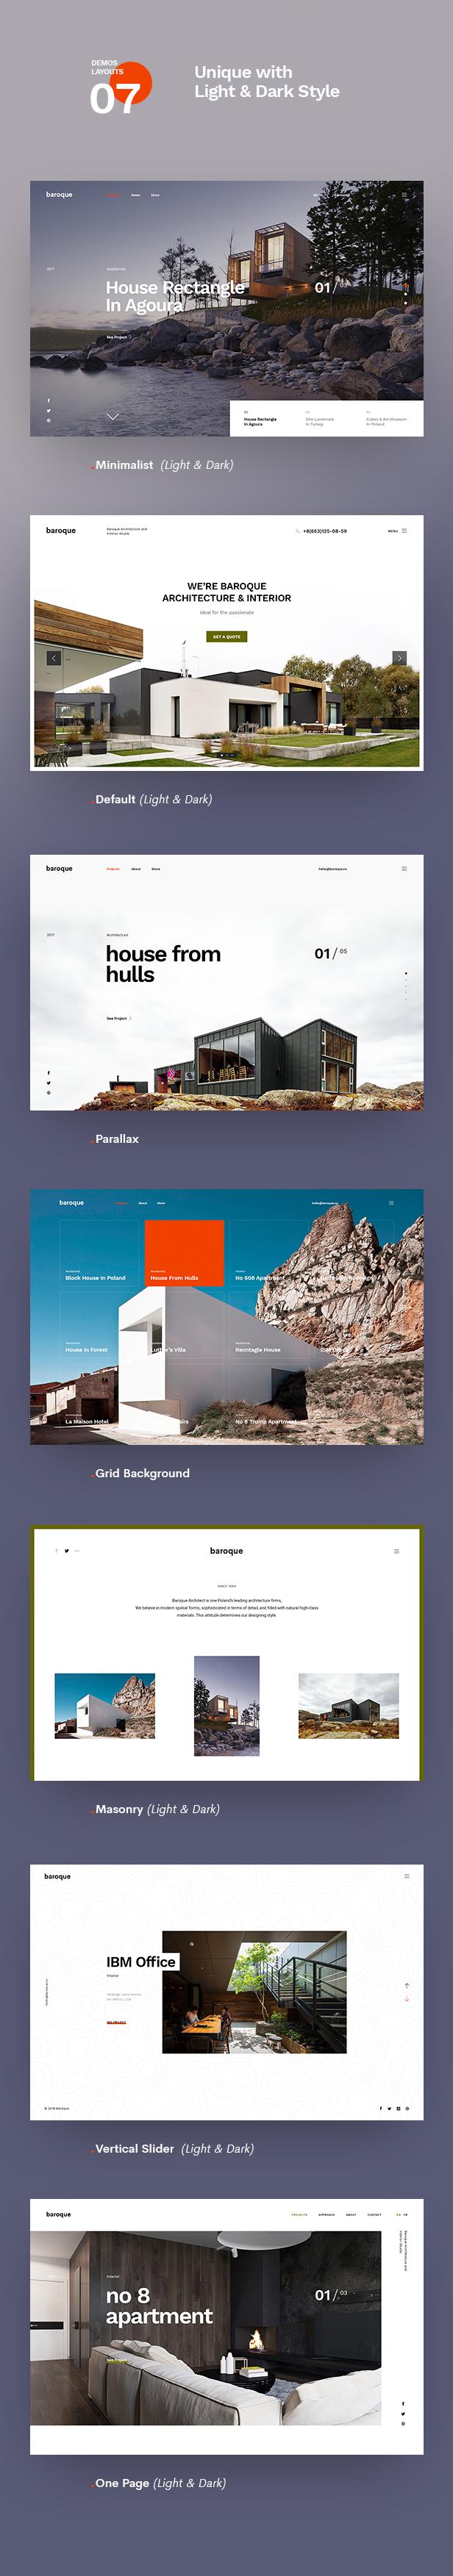 Baroque - Architecture & Interior WordPress Theme - 8